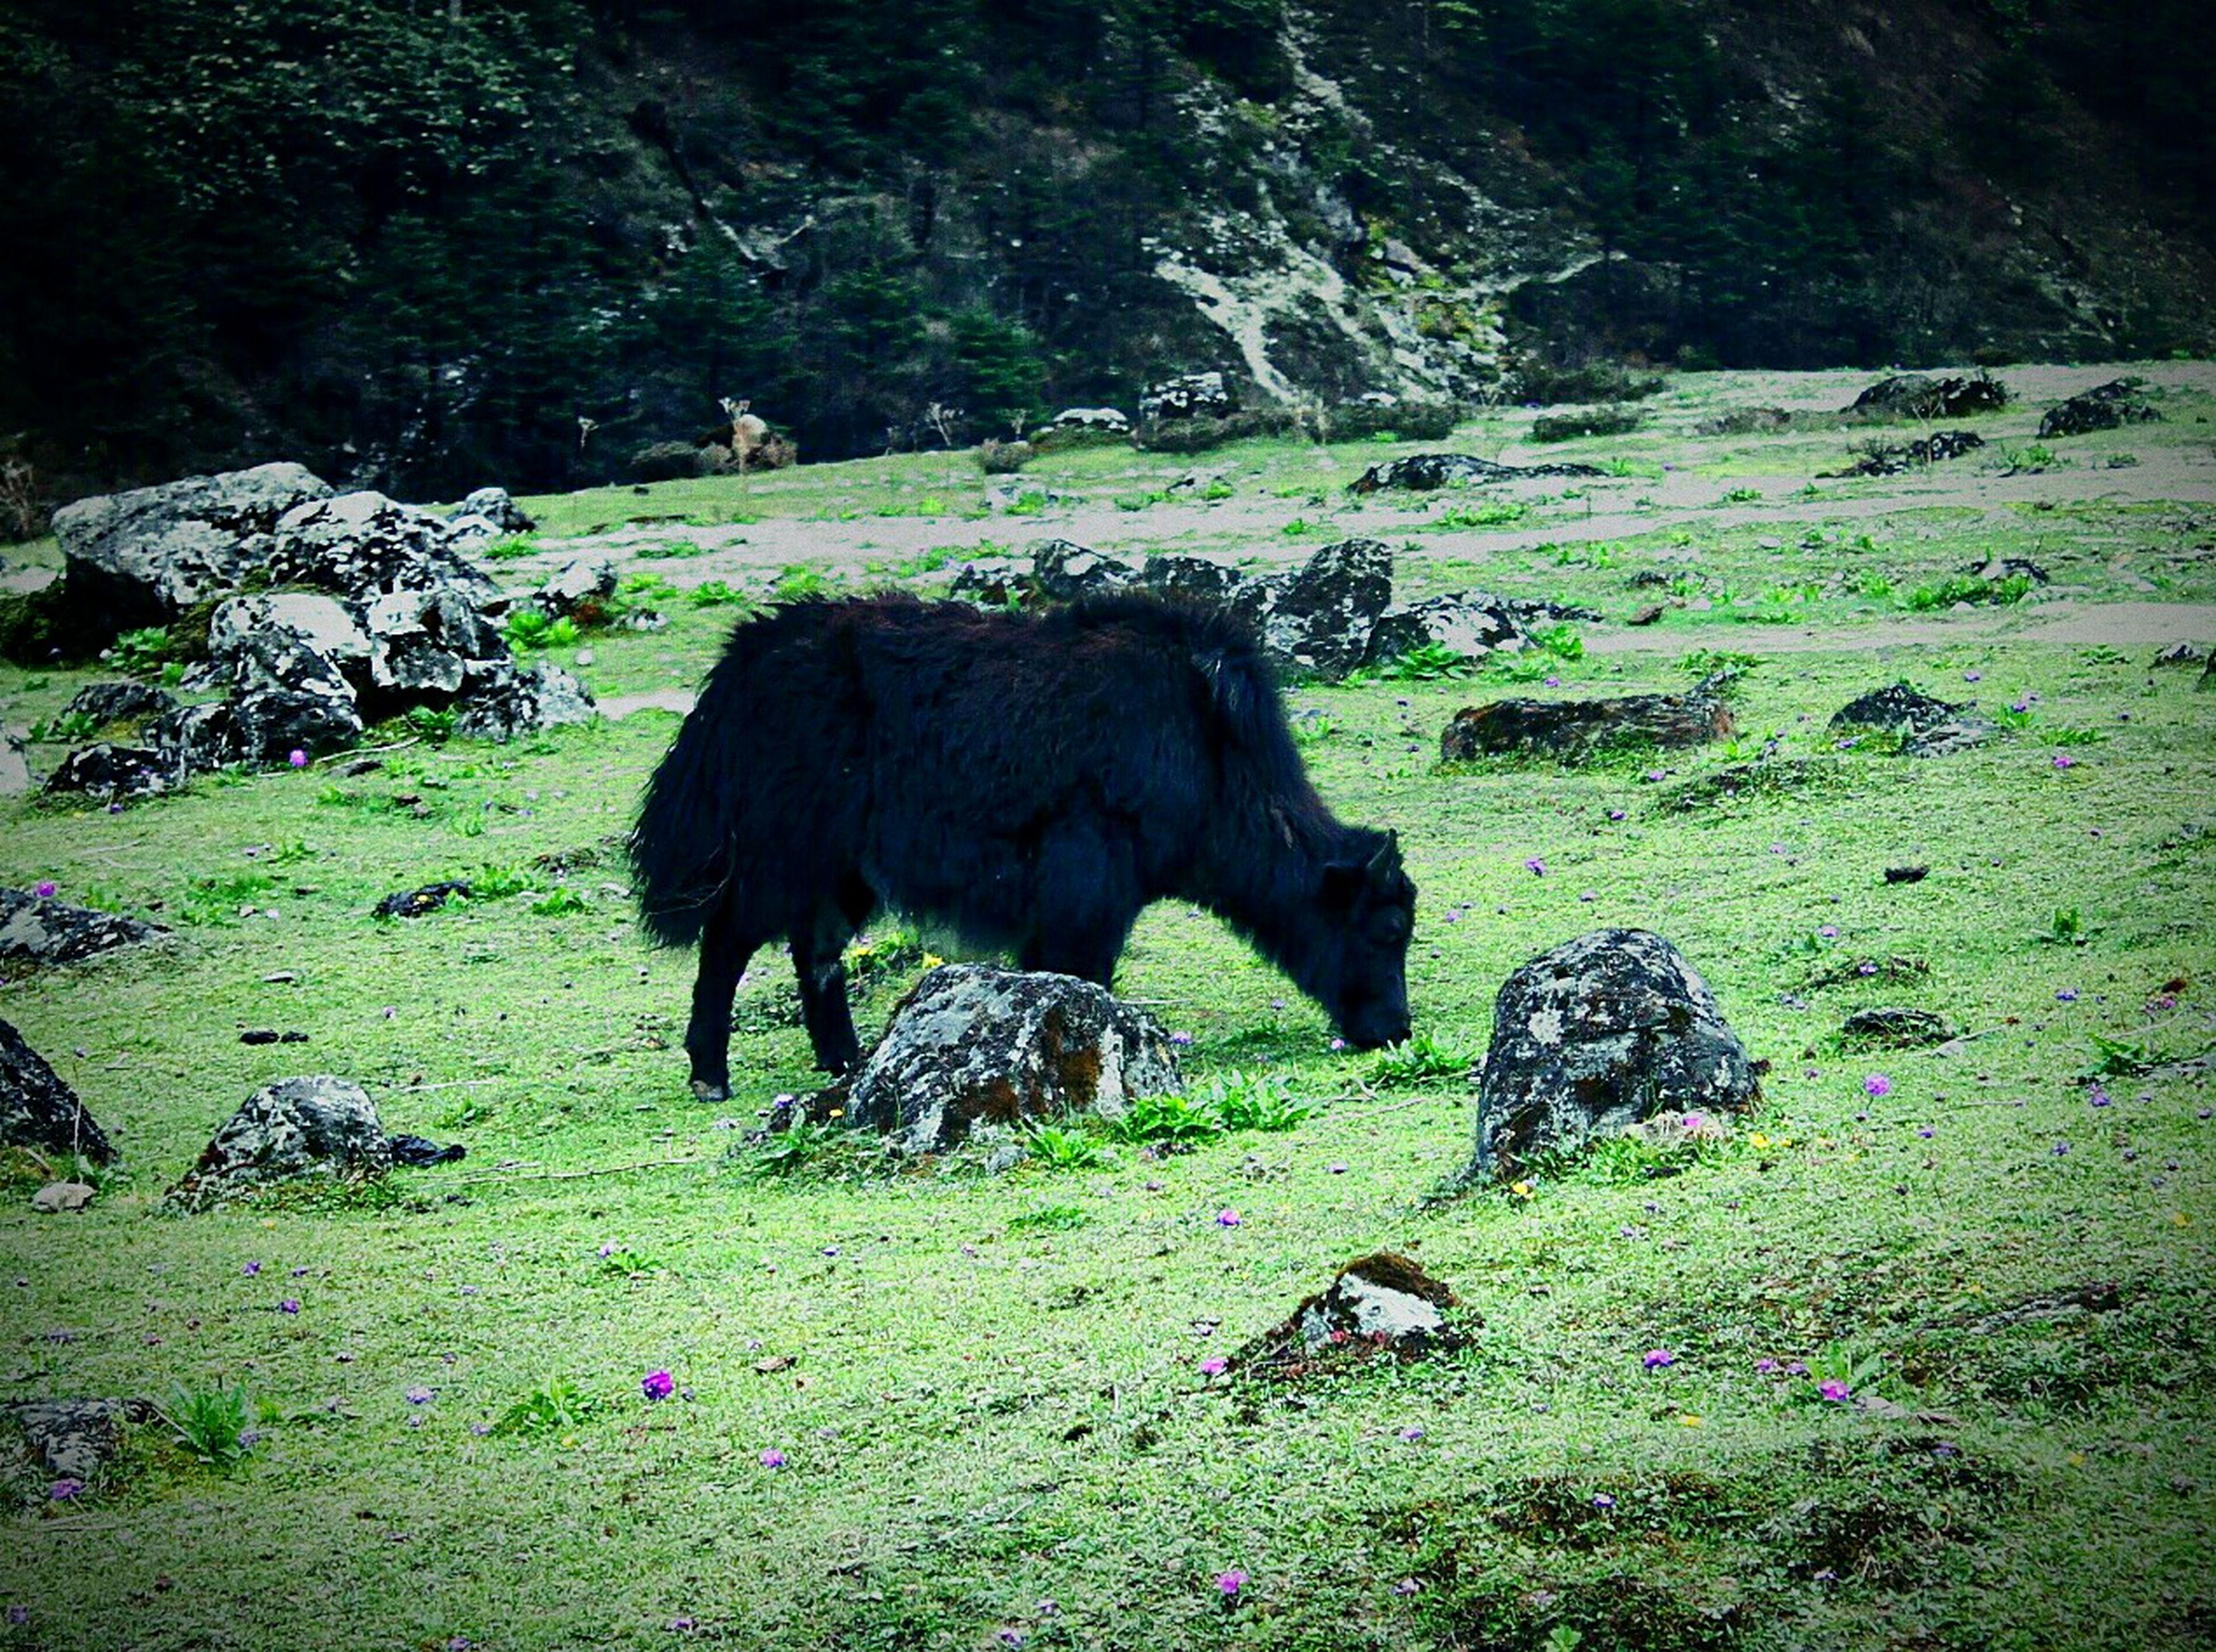 Mountain Yak Eating Lush Green Grass Animal Photography Animal_collection EyeEm Animal Lover Hilly Area Taken In Sikkim, India Incredible India ☺☺😊😊